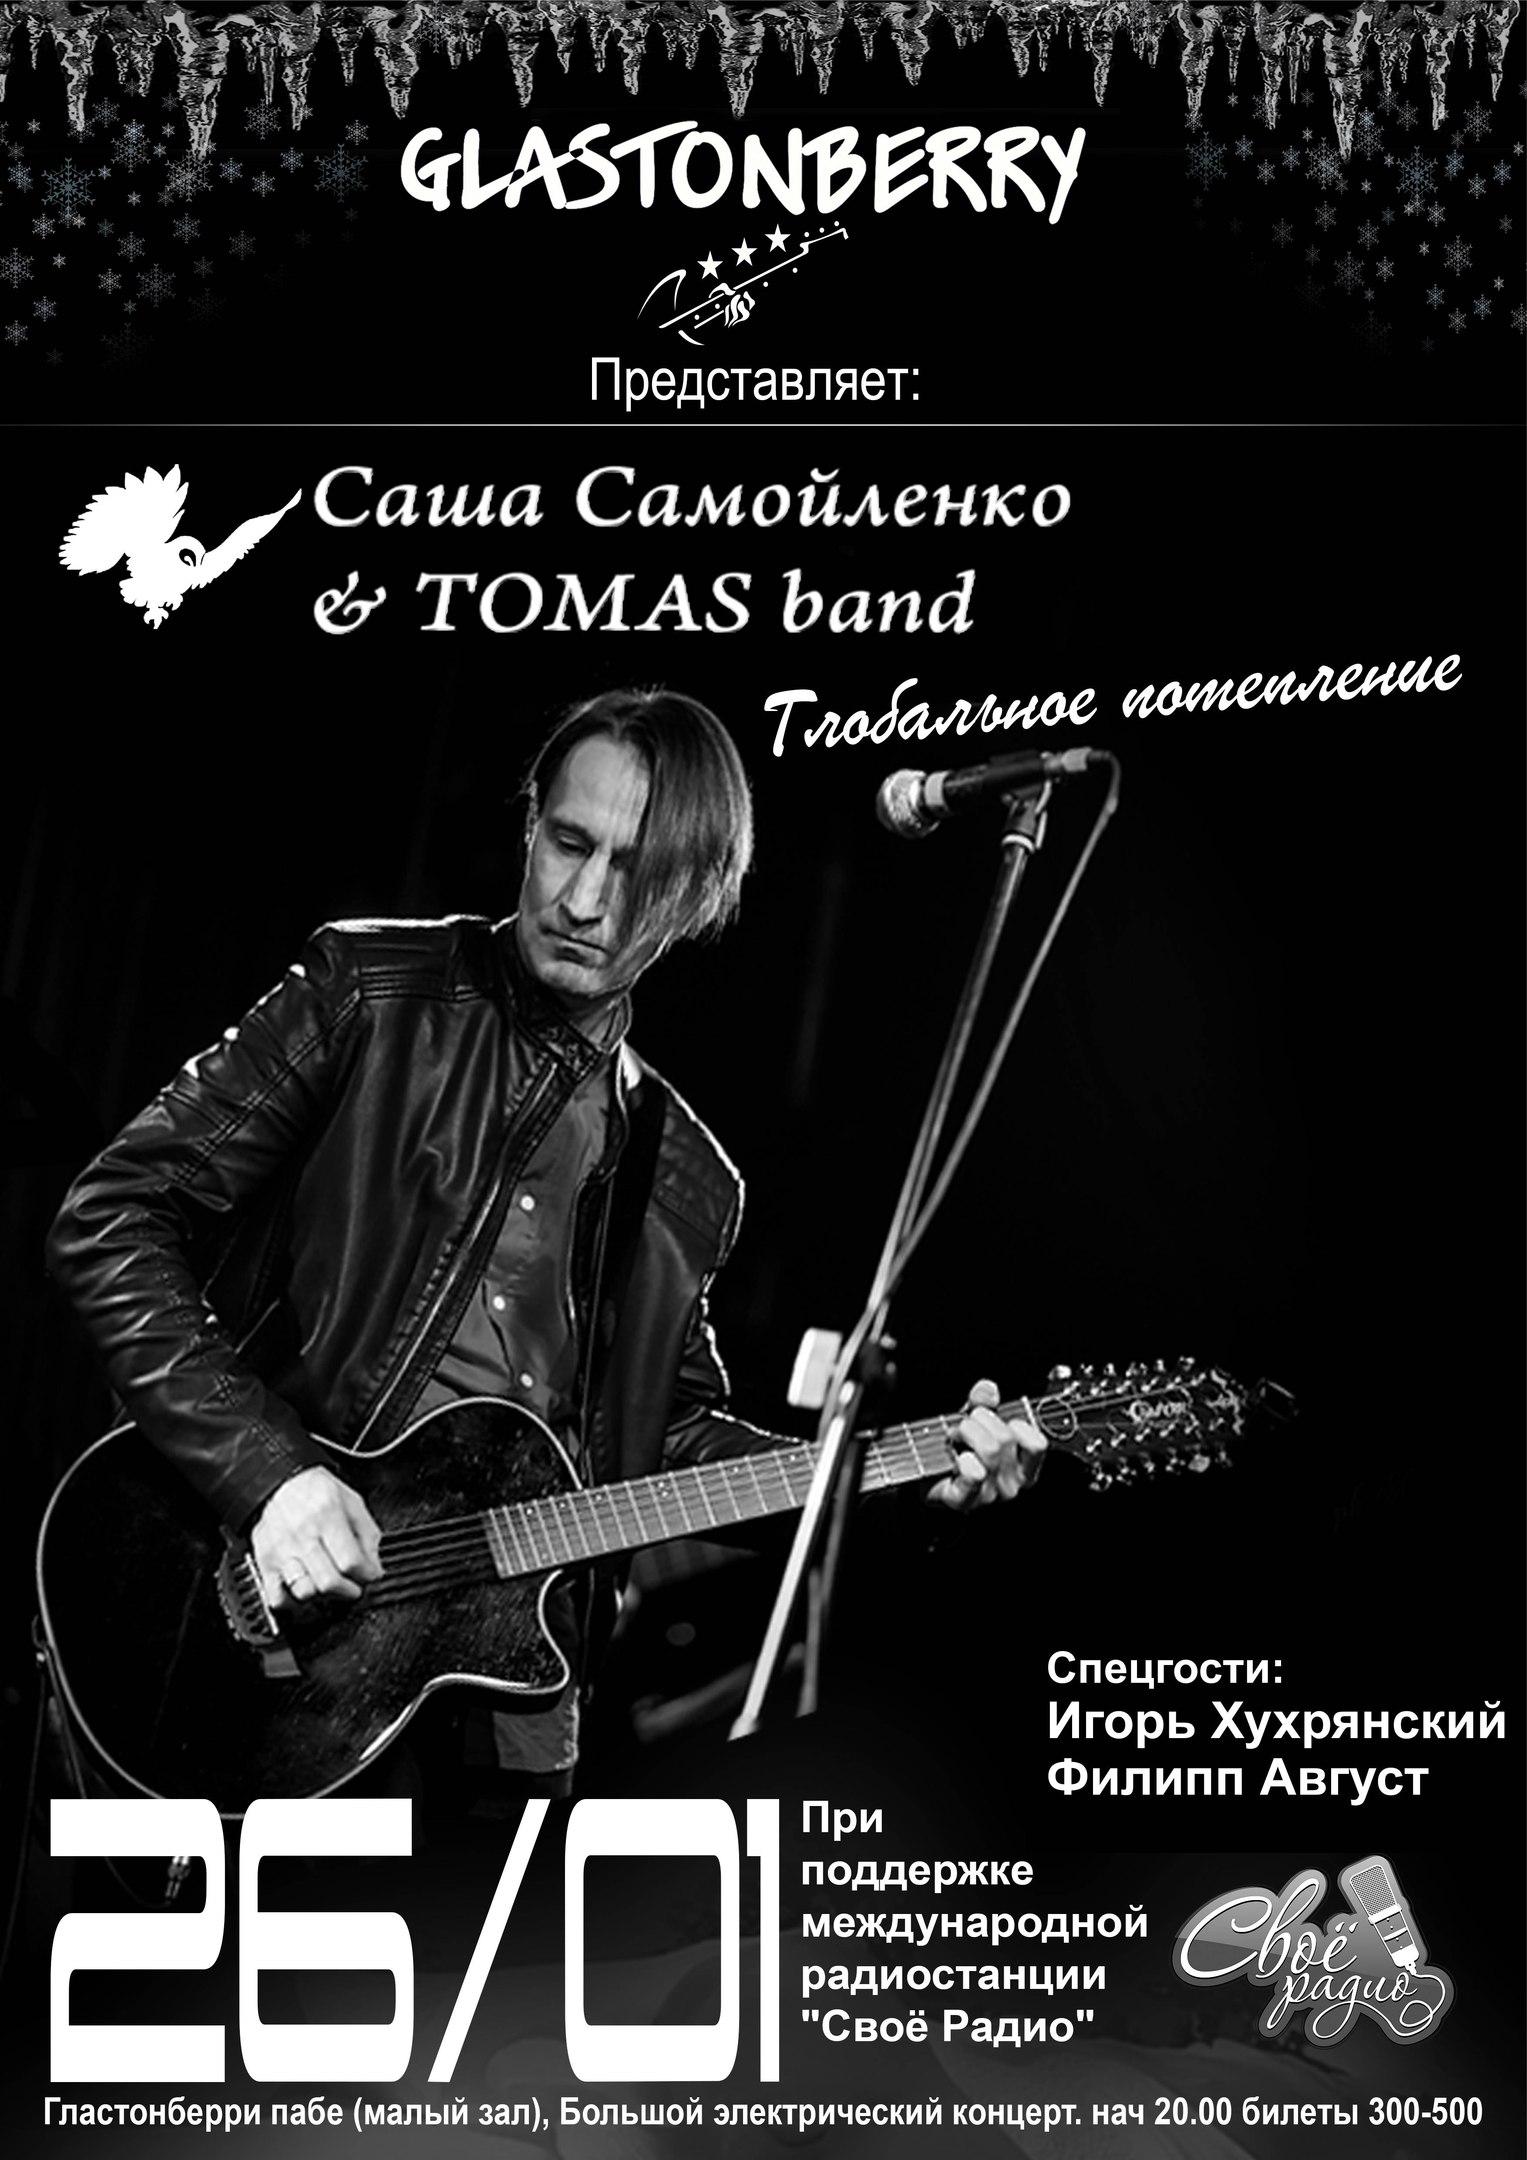 Саша Самойленко & TOMAS band / Москва / 26.01.2018 @ Glastonberry    Москва   Россия